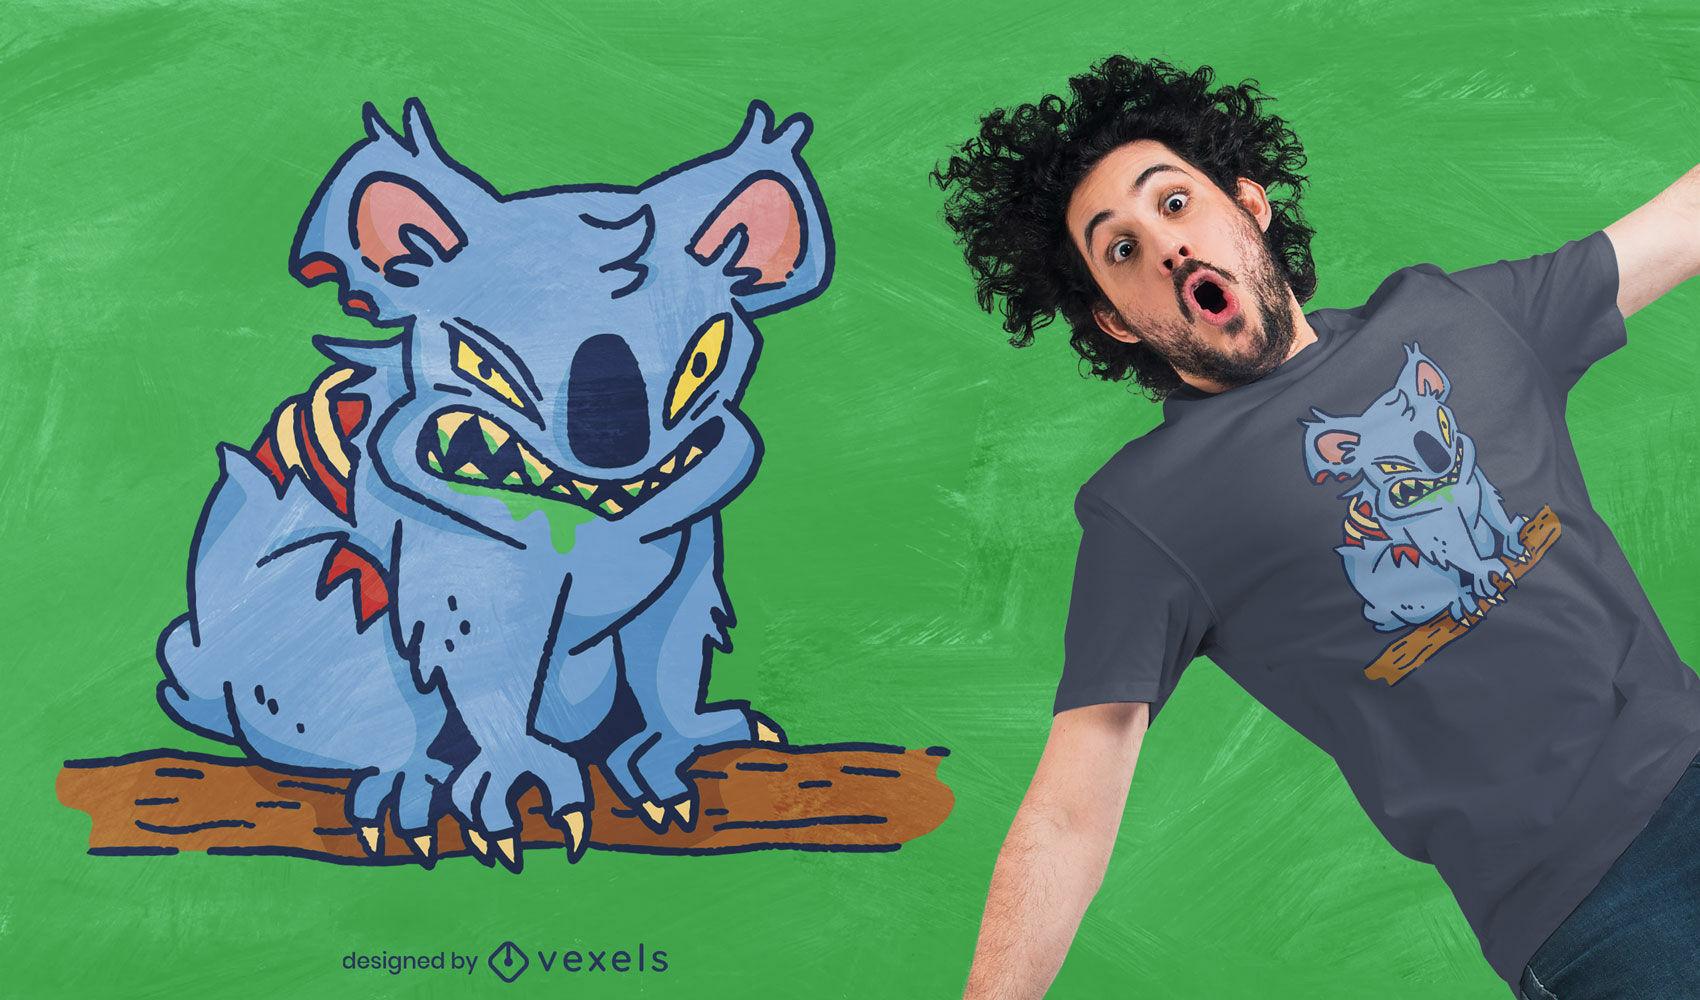 Design de camiseta com animal coala zumbi assustador